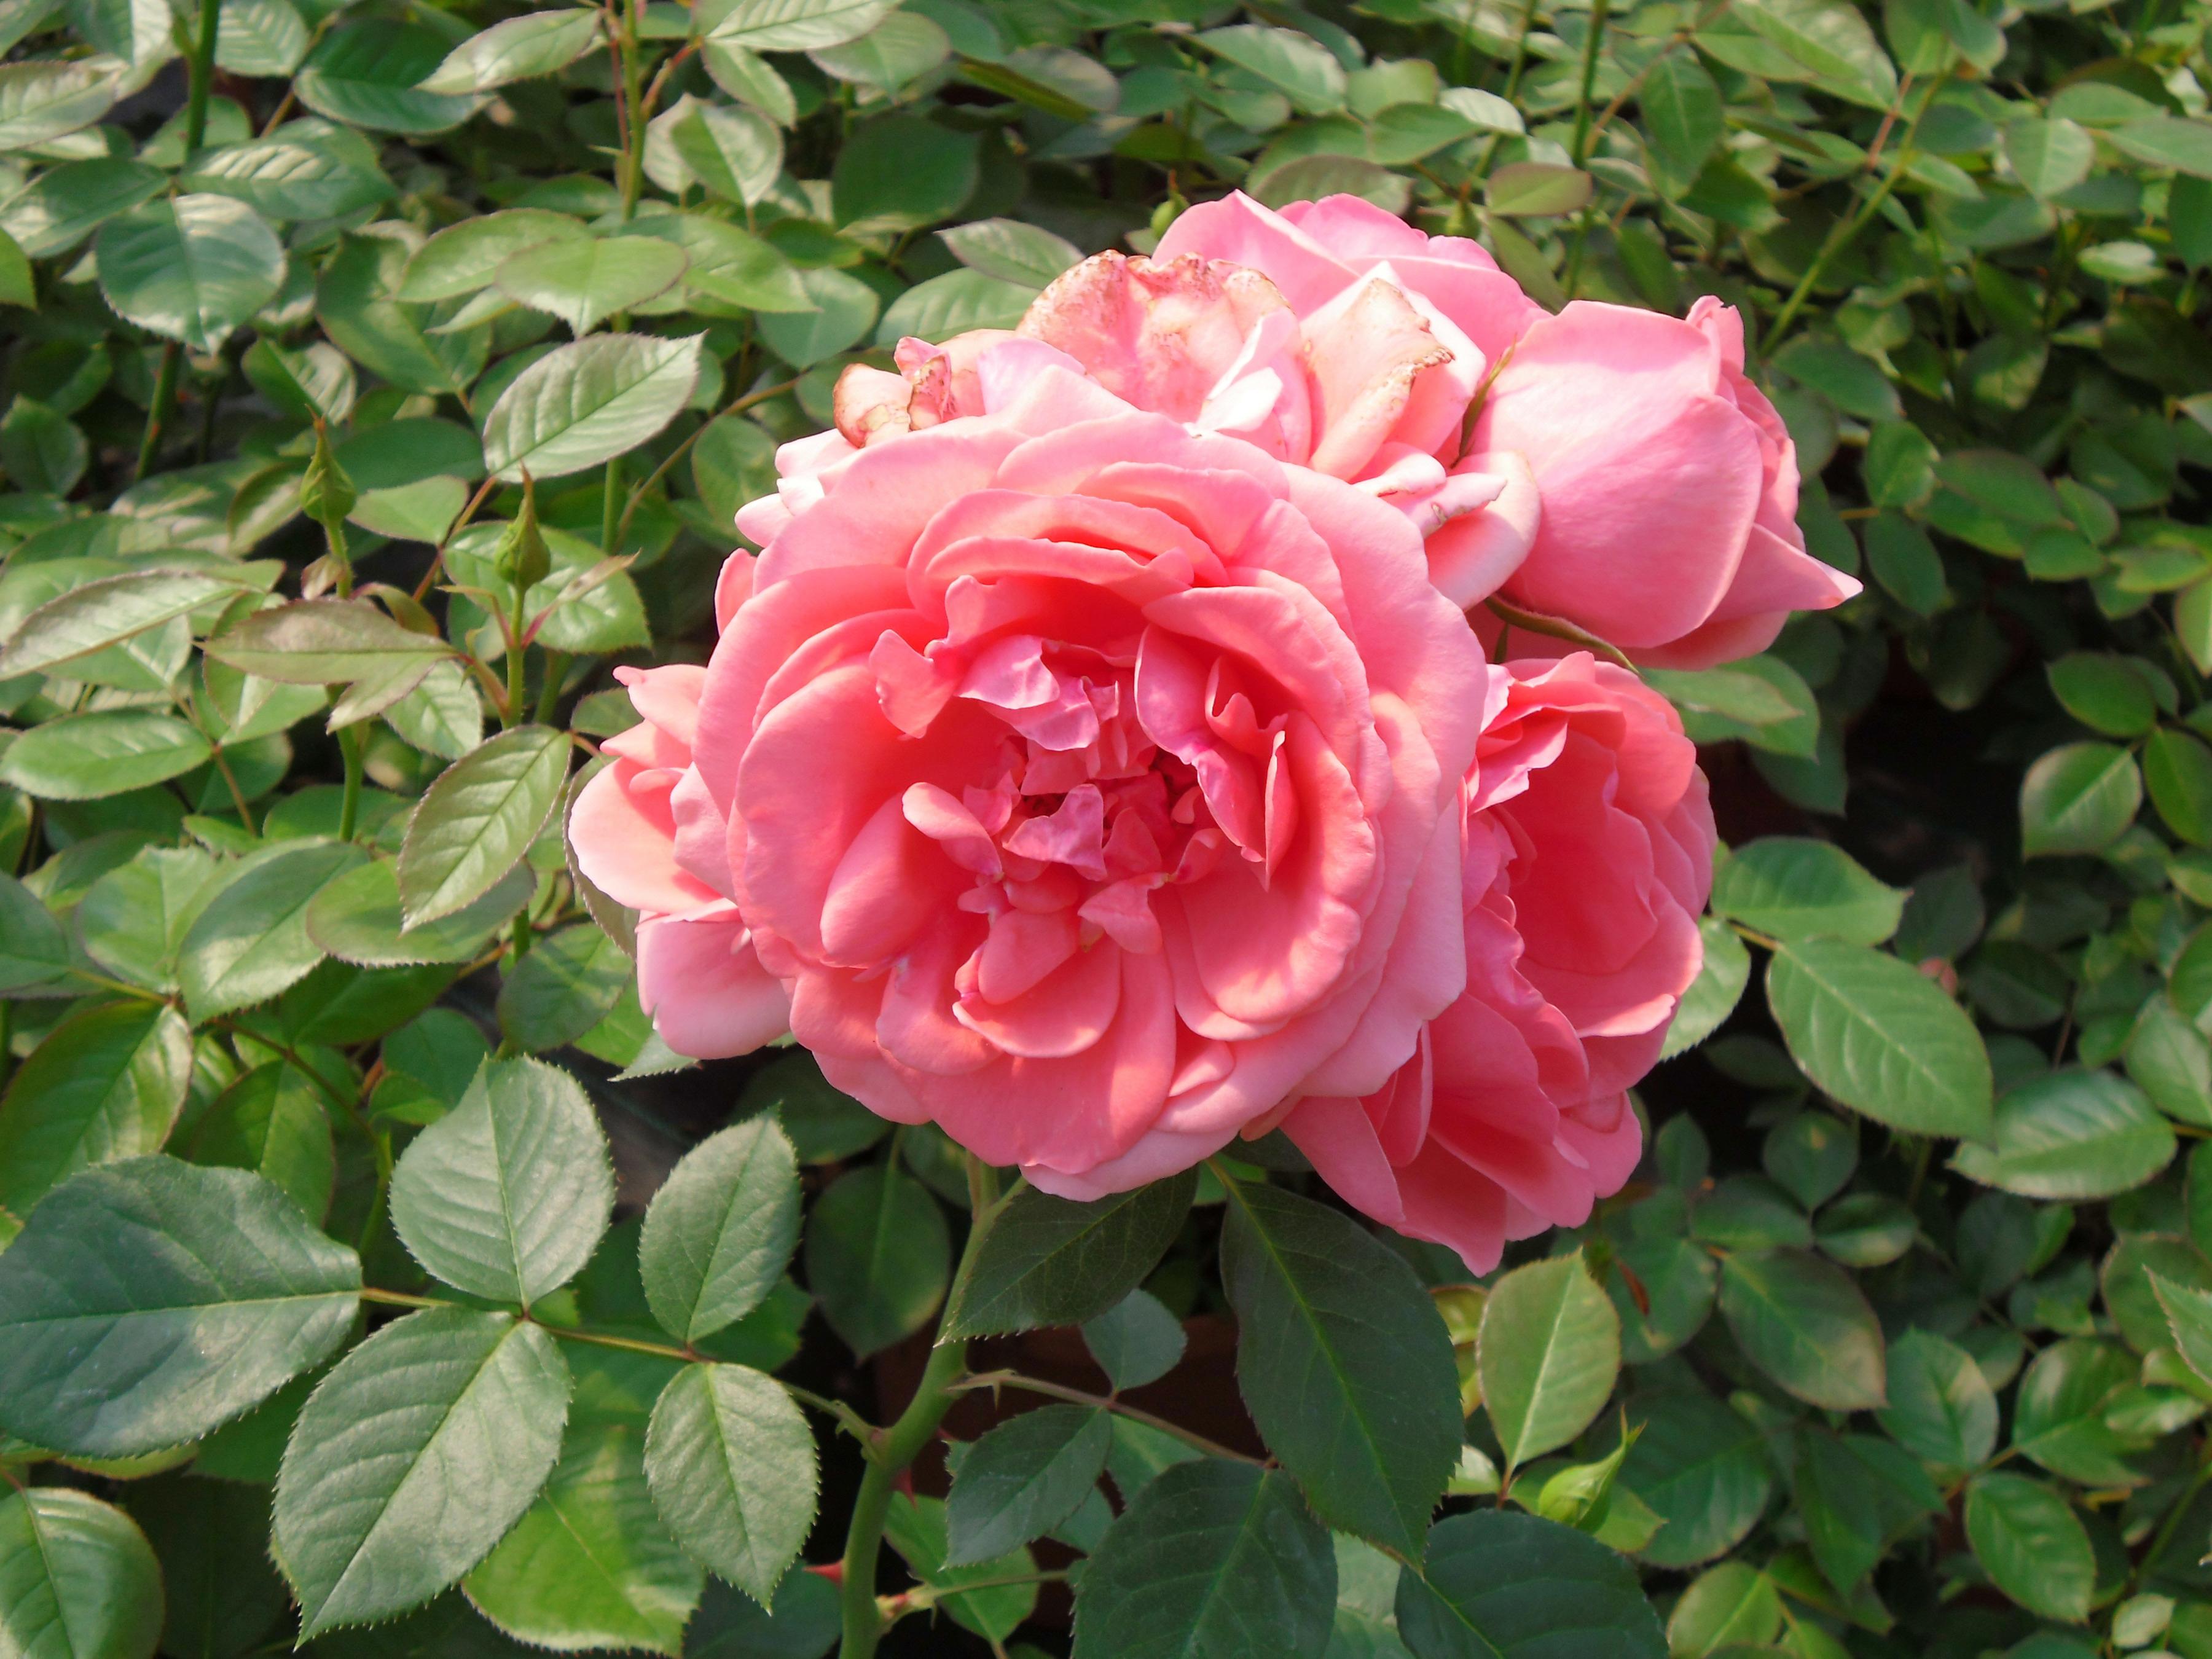 BCM Beetpflanze Rose Kimono orange Beetpflanzen Pflanzen Garten Balkon